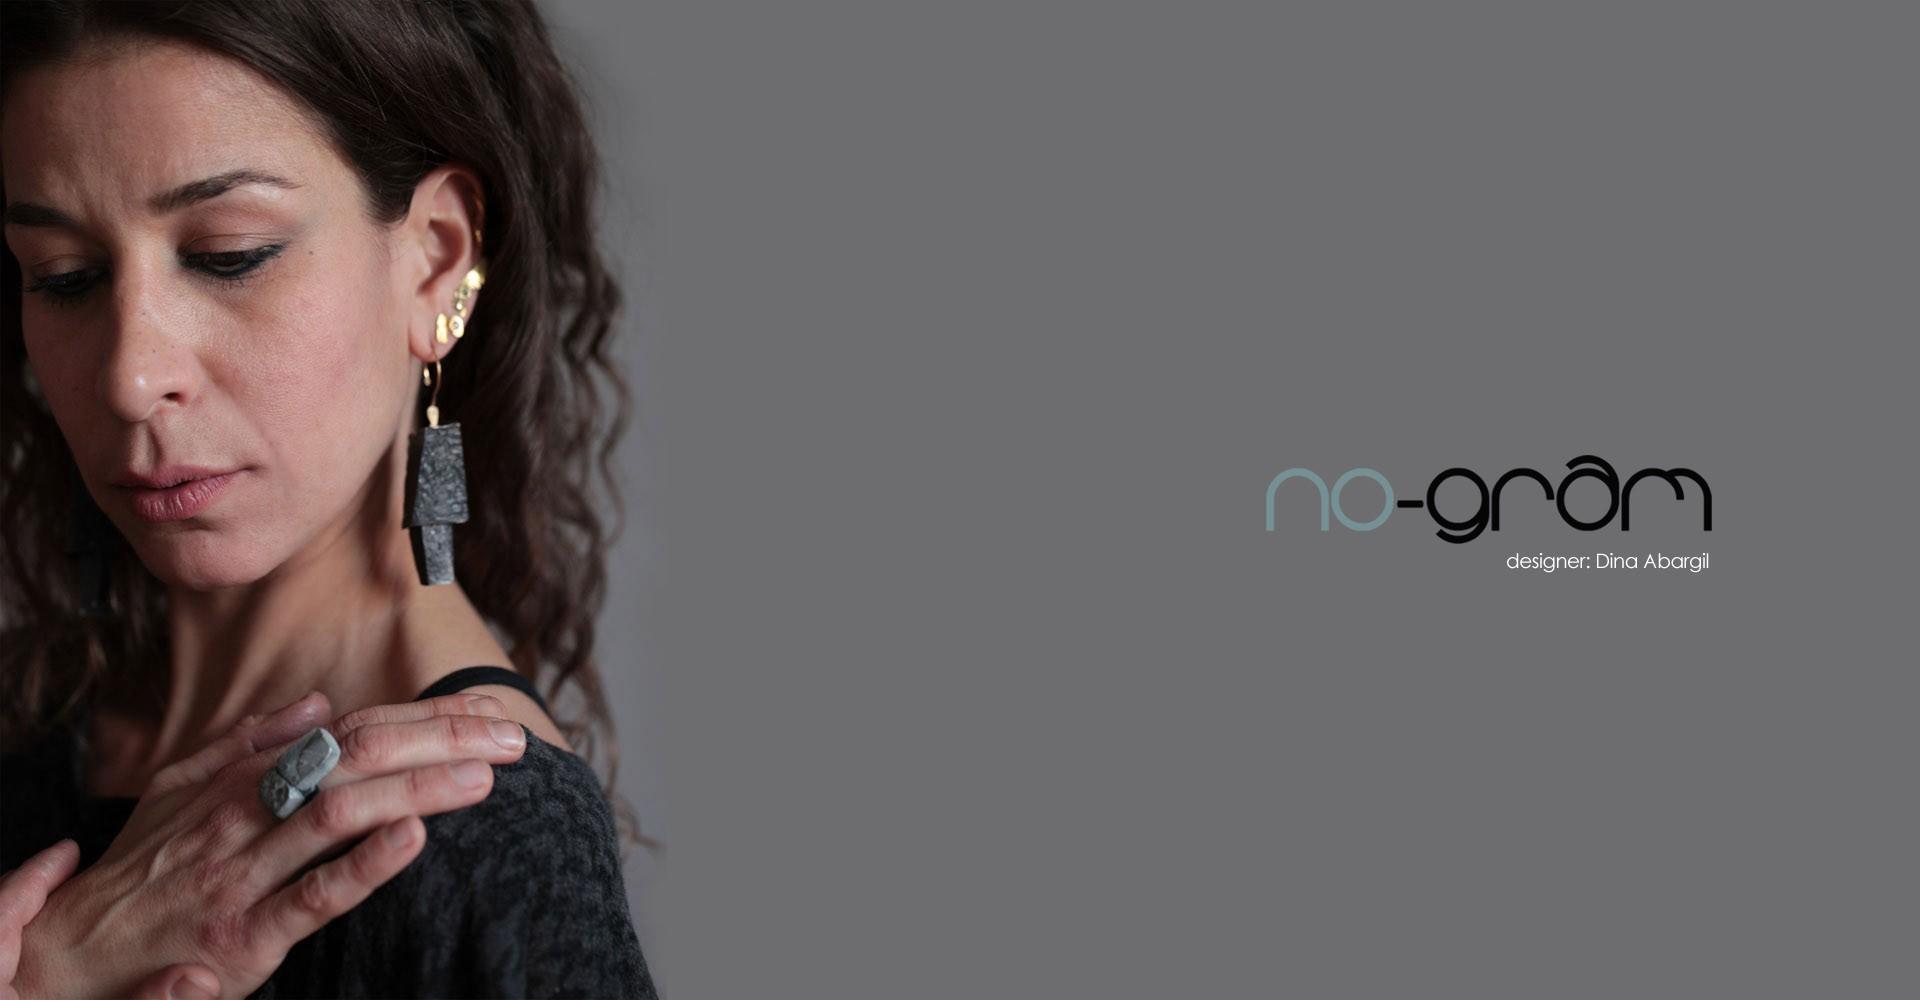 Dina Abargil - Israel | no-gram |